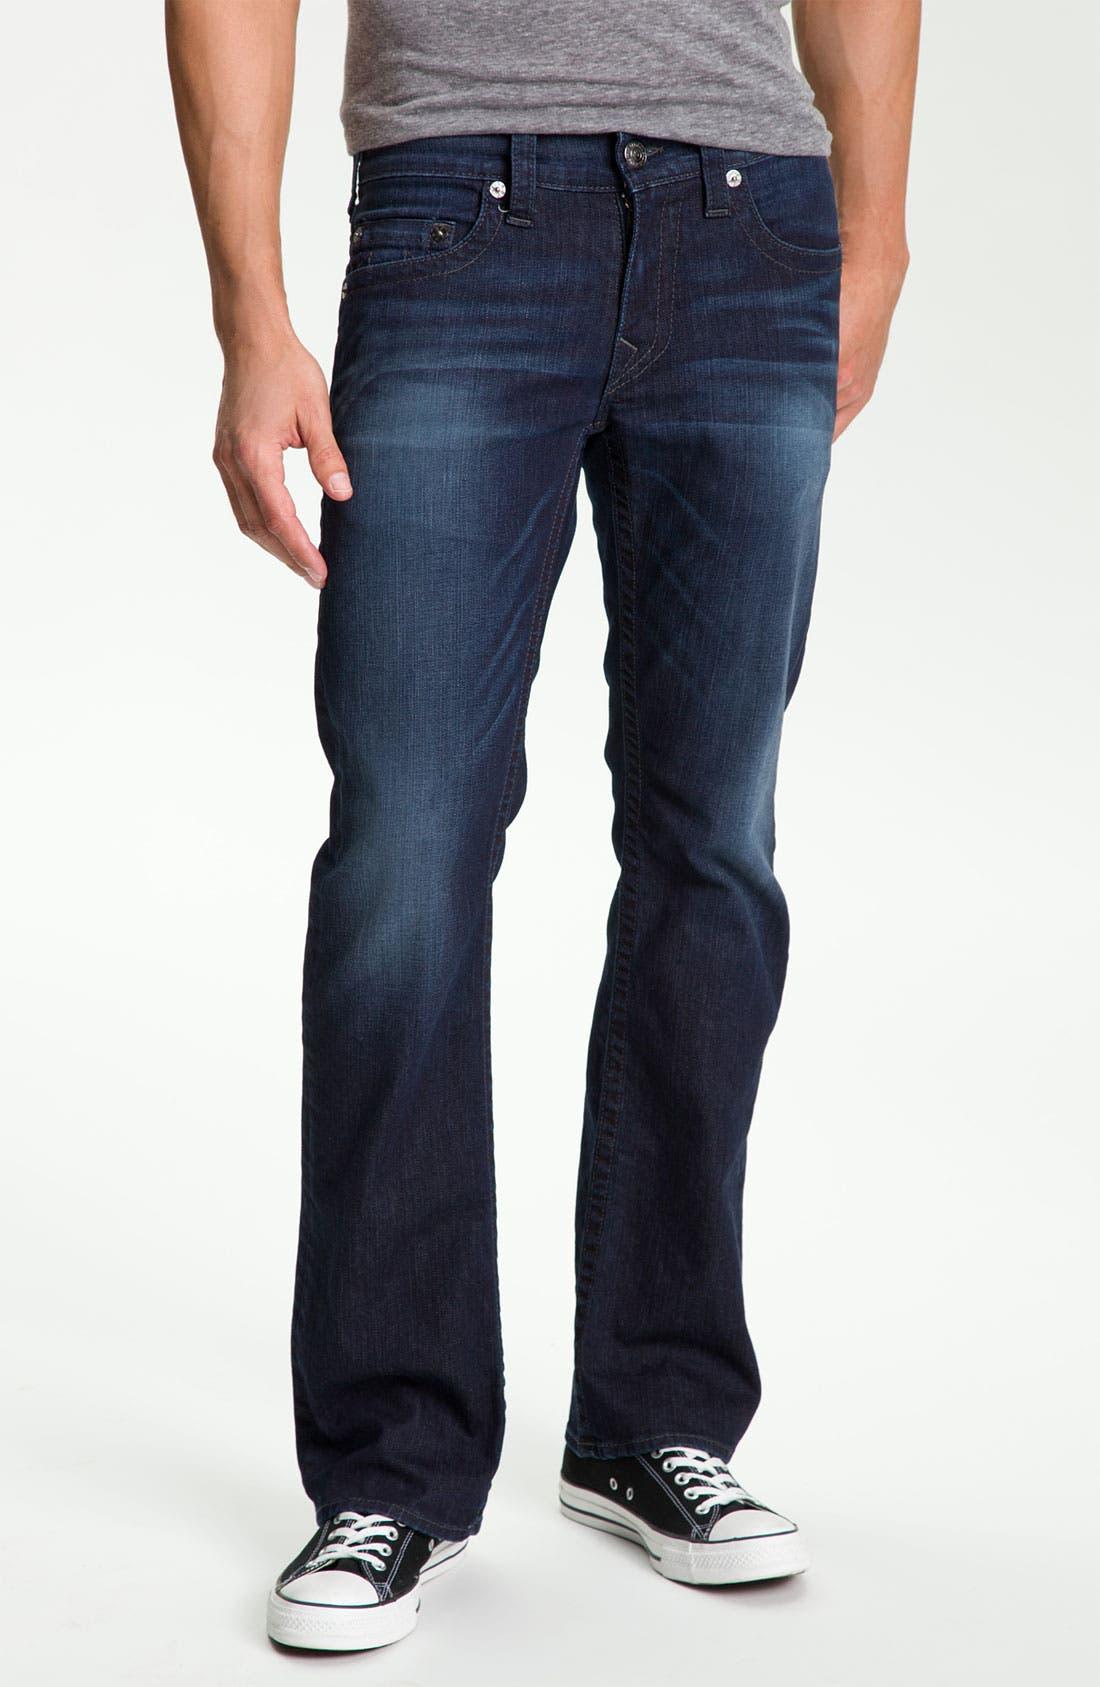 Alternate Image 2  - True Religion Brand Jeans 'Danny' Bootcut Jeans (Franklin)